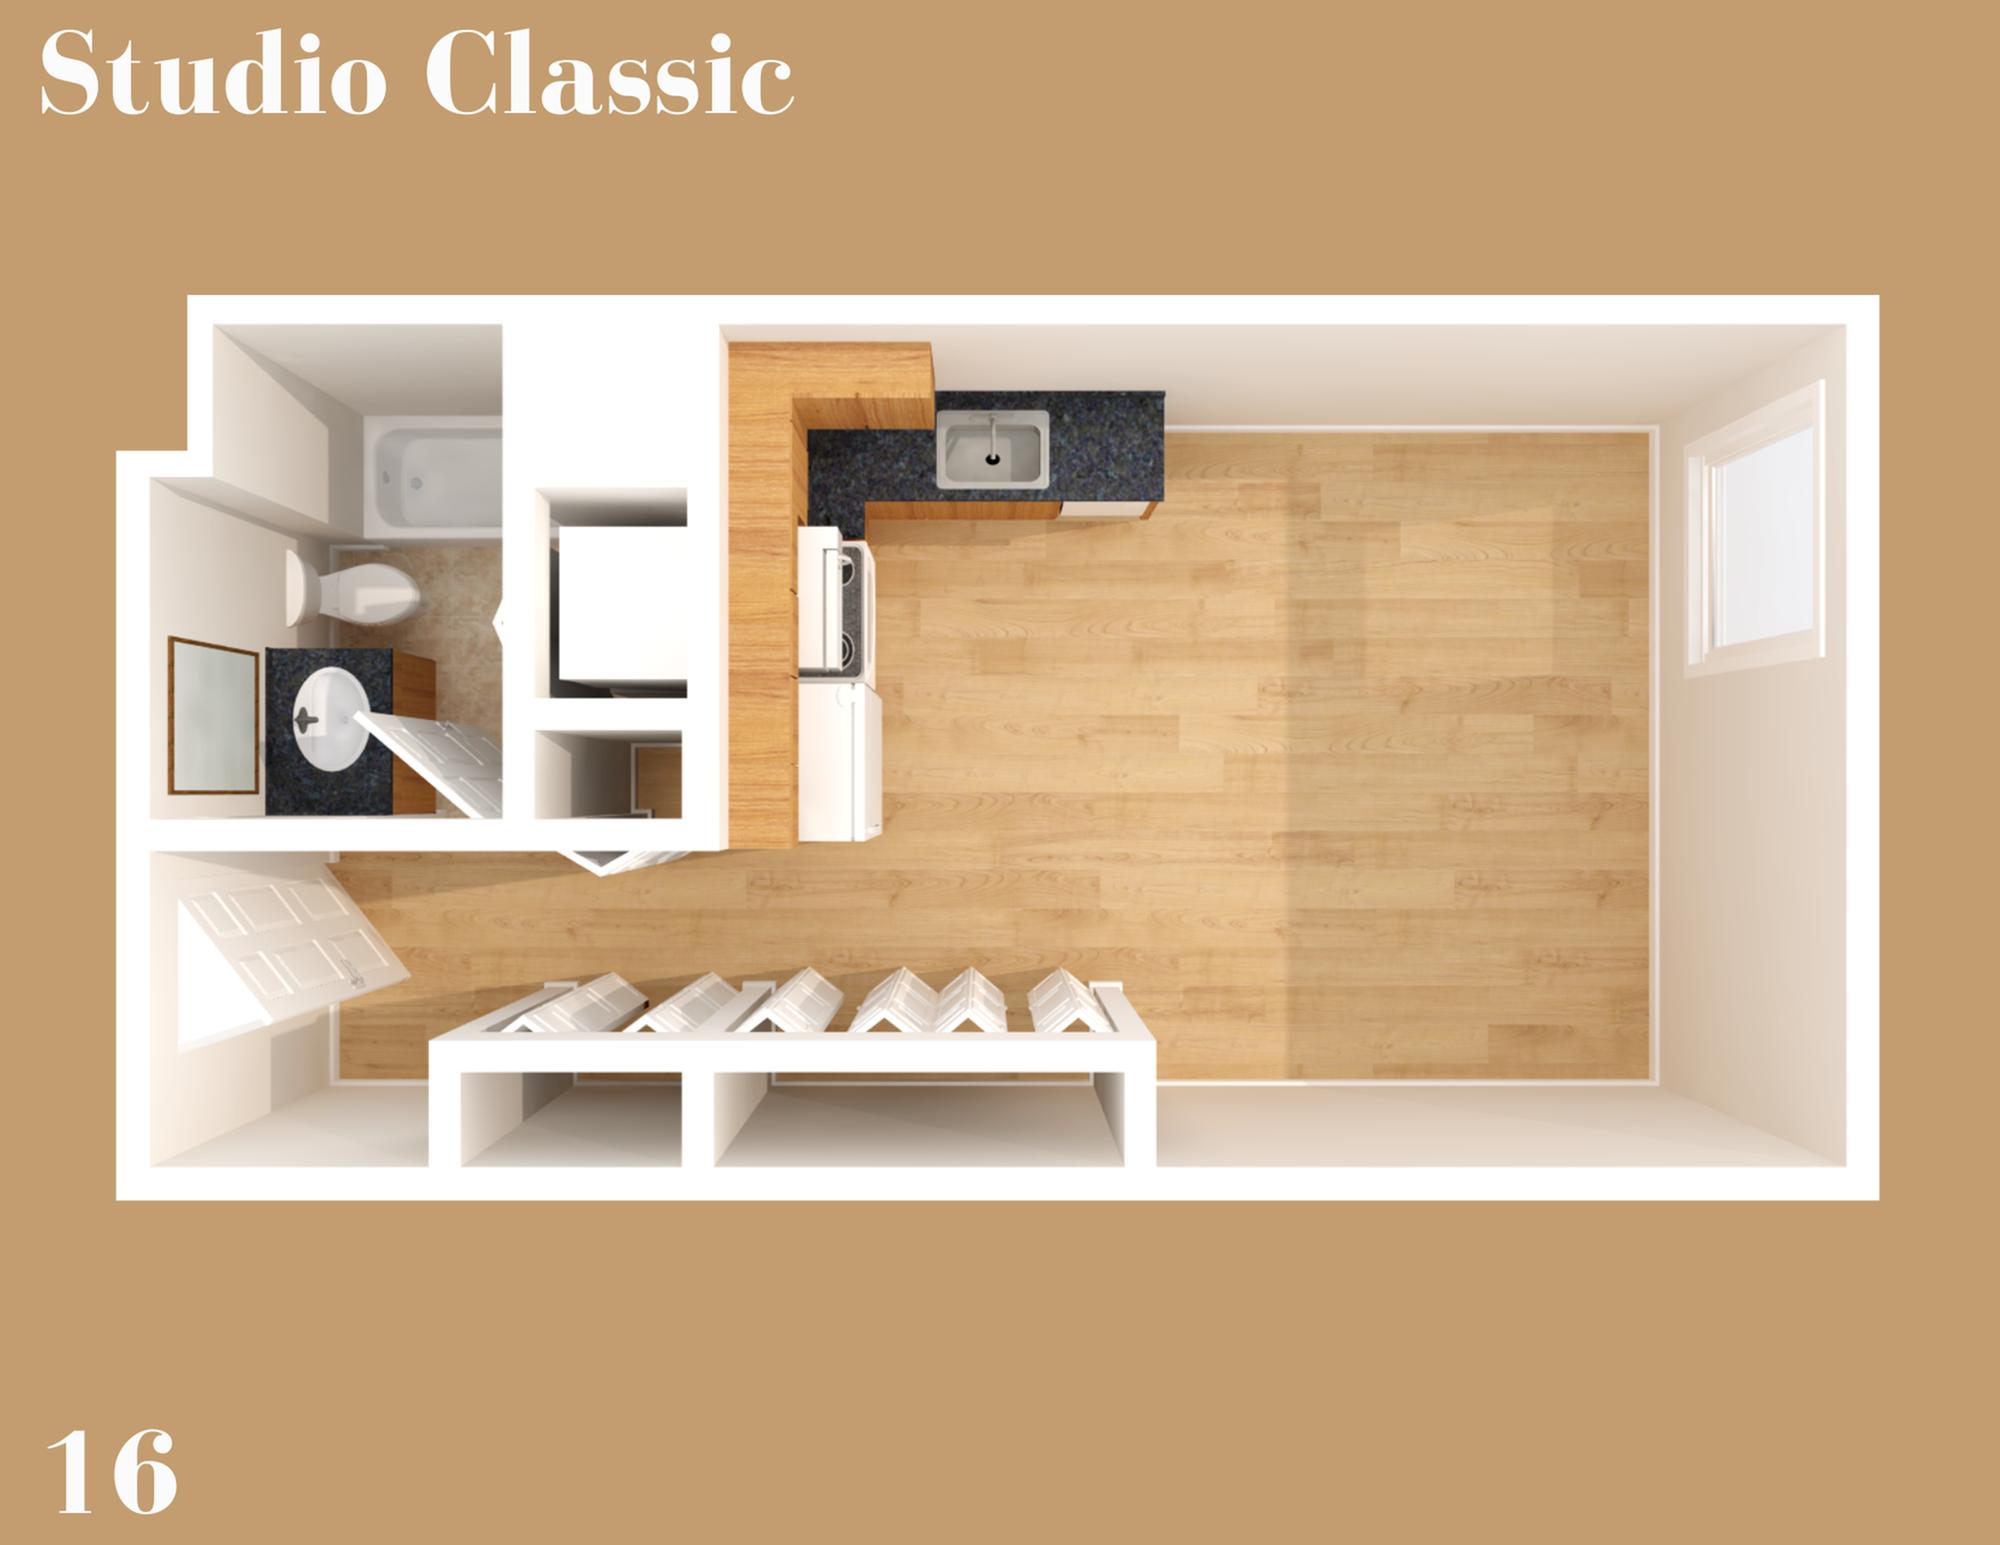 Lothlorien Studio Classic 16